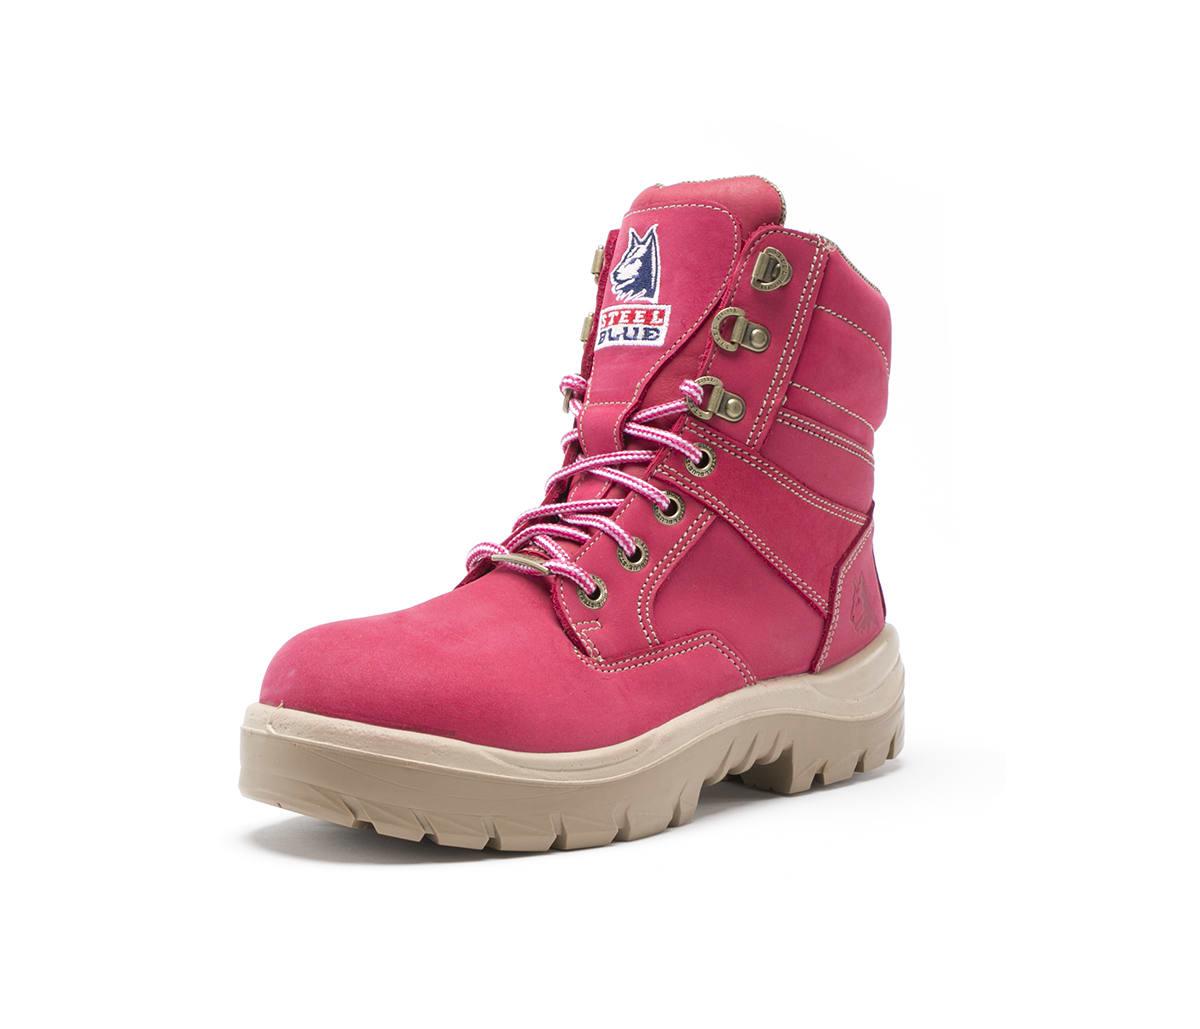 Southern Cross Ladies - Pink